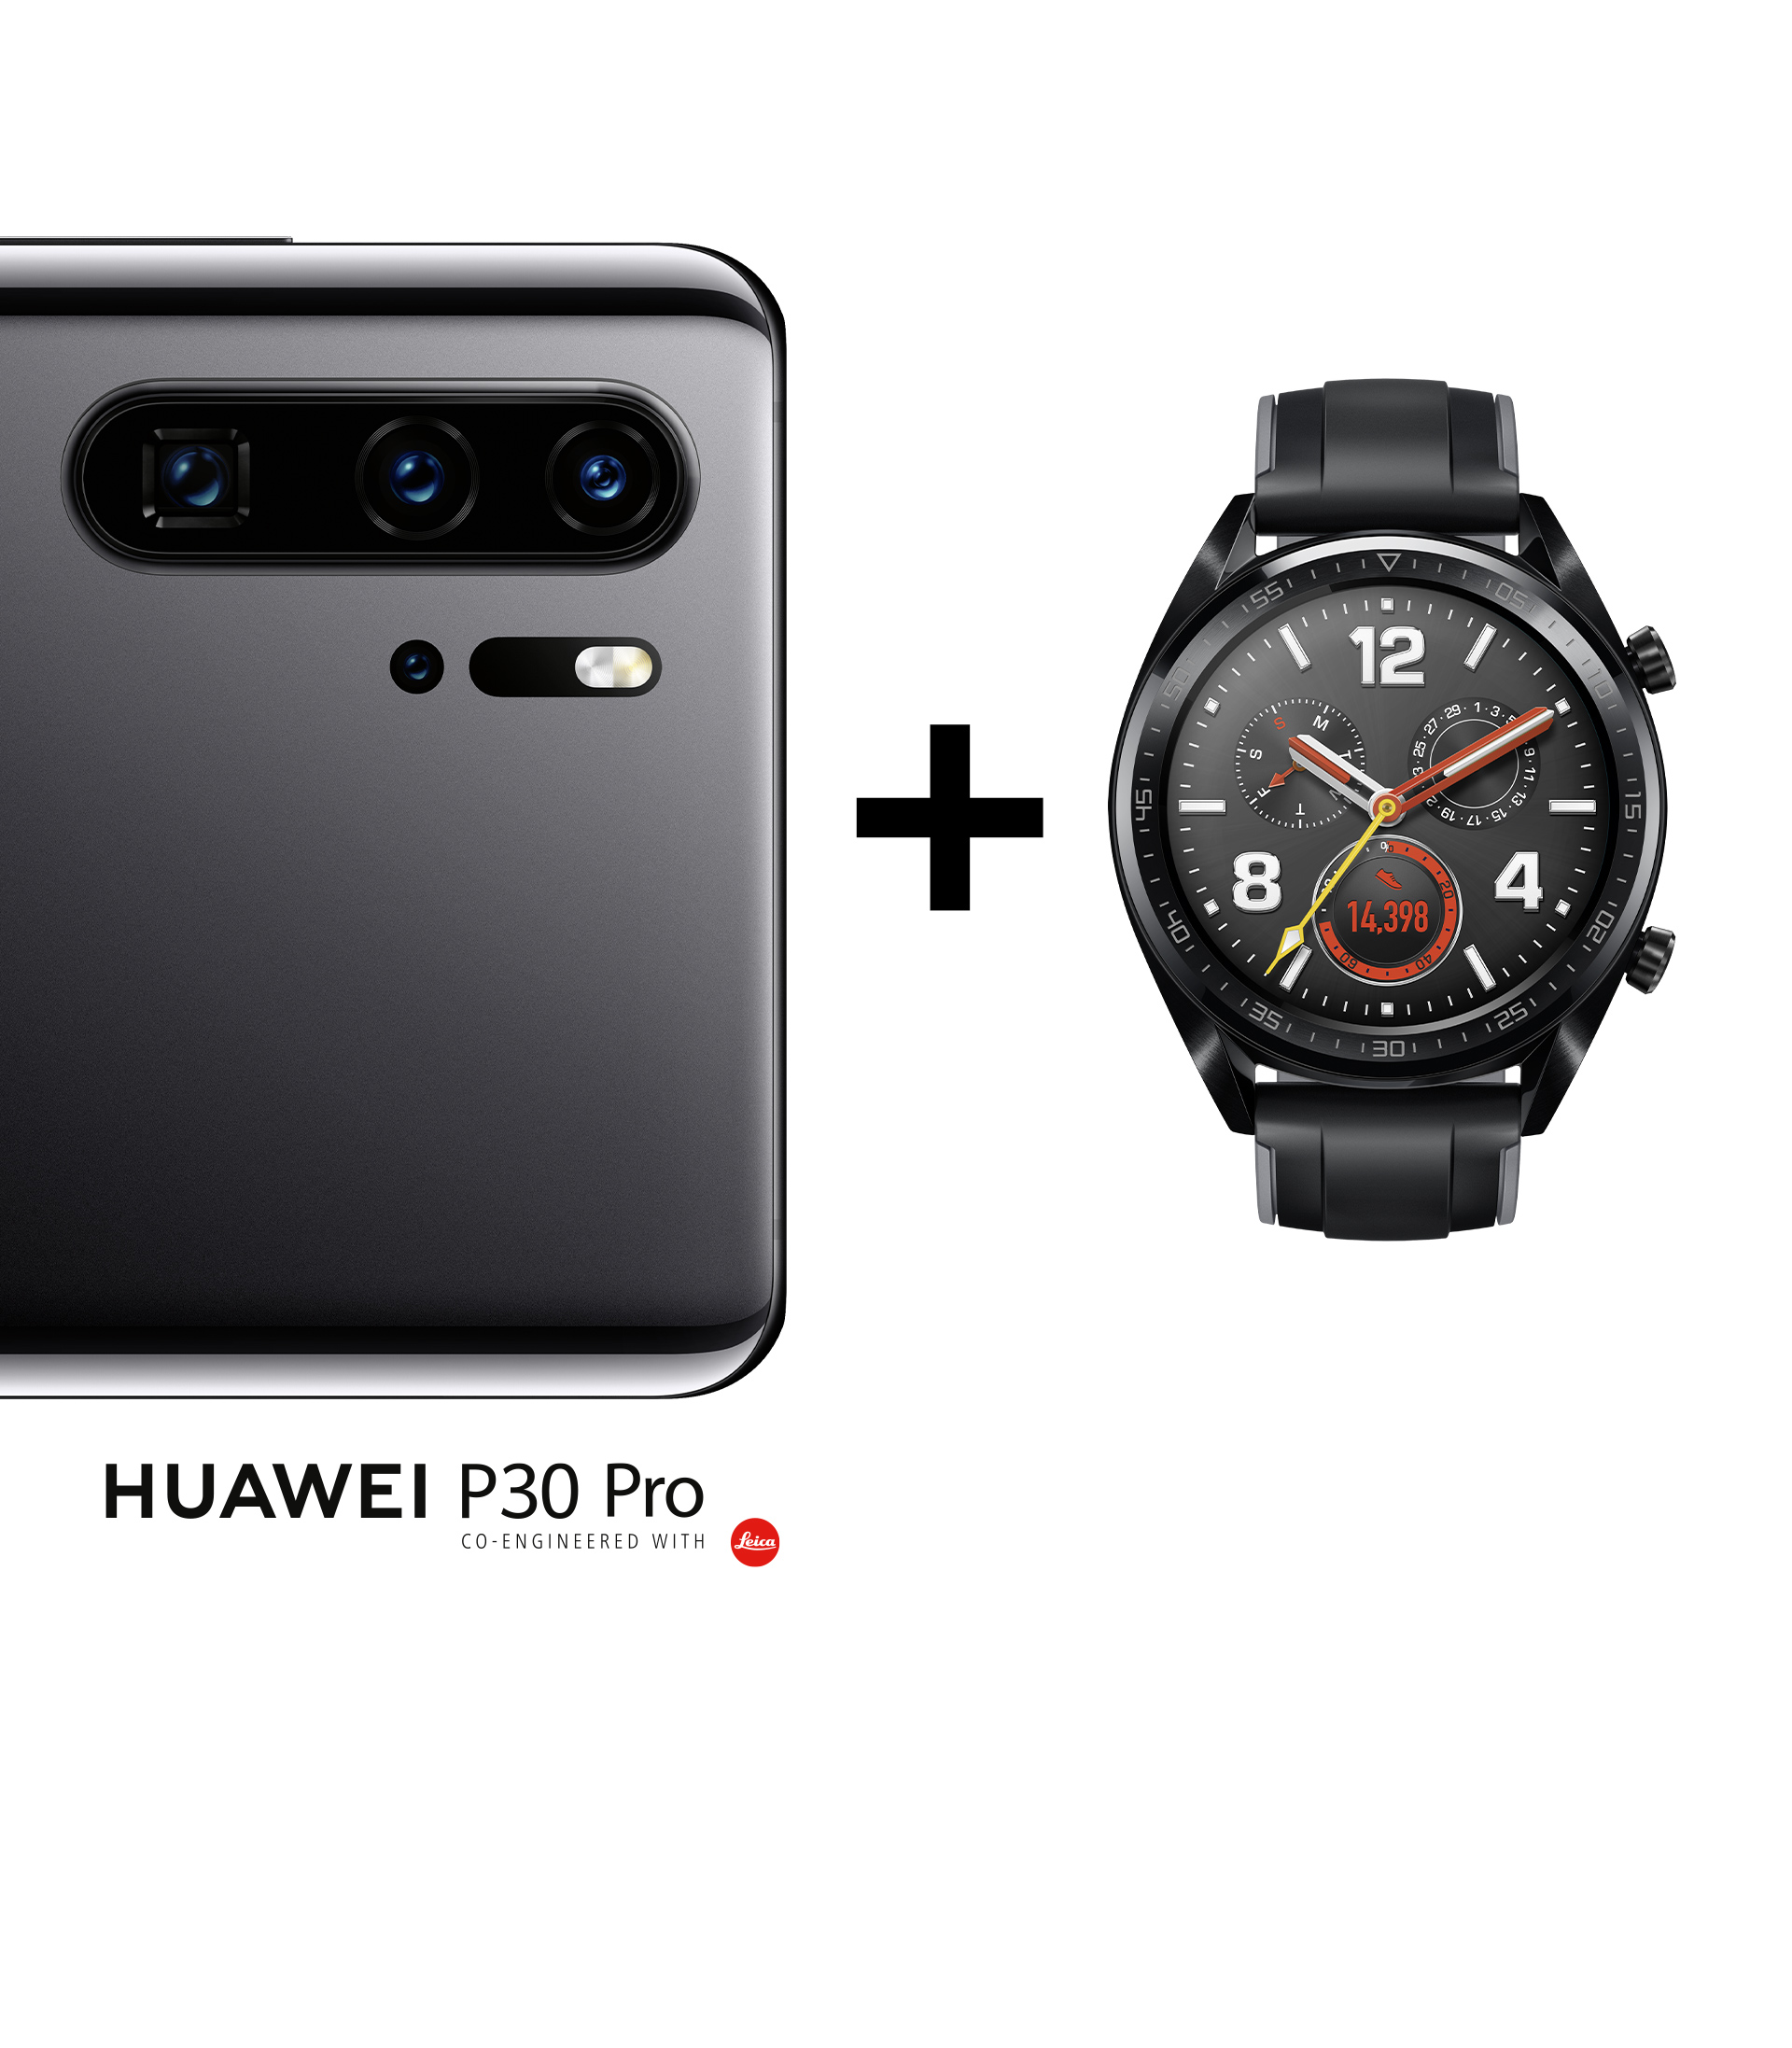 HUAWEI P30 Pro mit HUAWEI Watch GT in schwarz